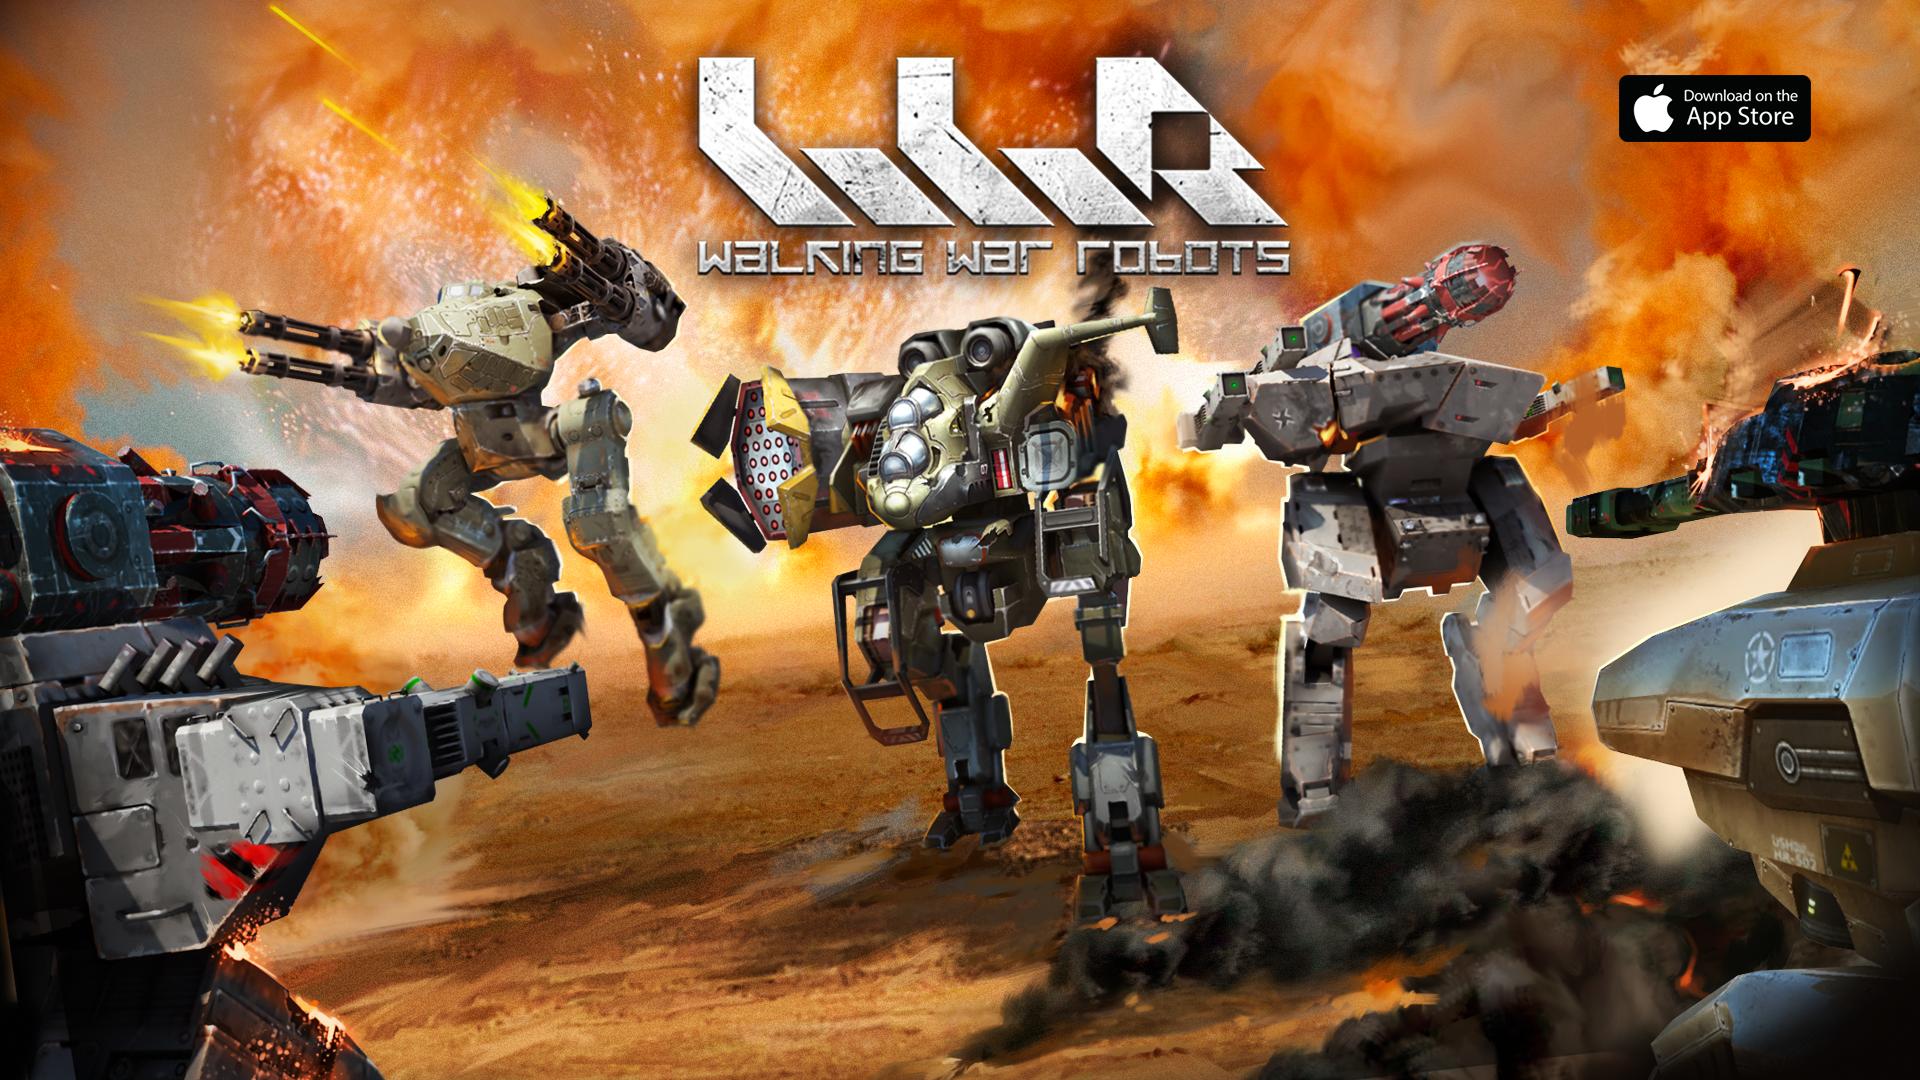 Walking War Robots Wallpapers Video Game Hq Walking War Robots Pictures 4k Wallpapers 2019